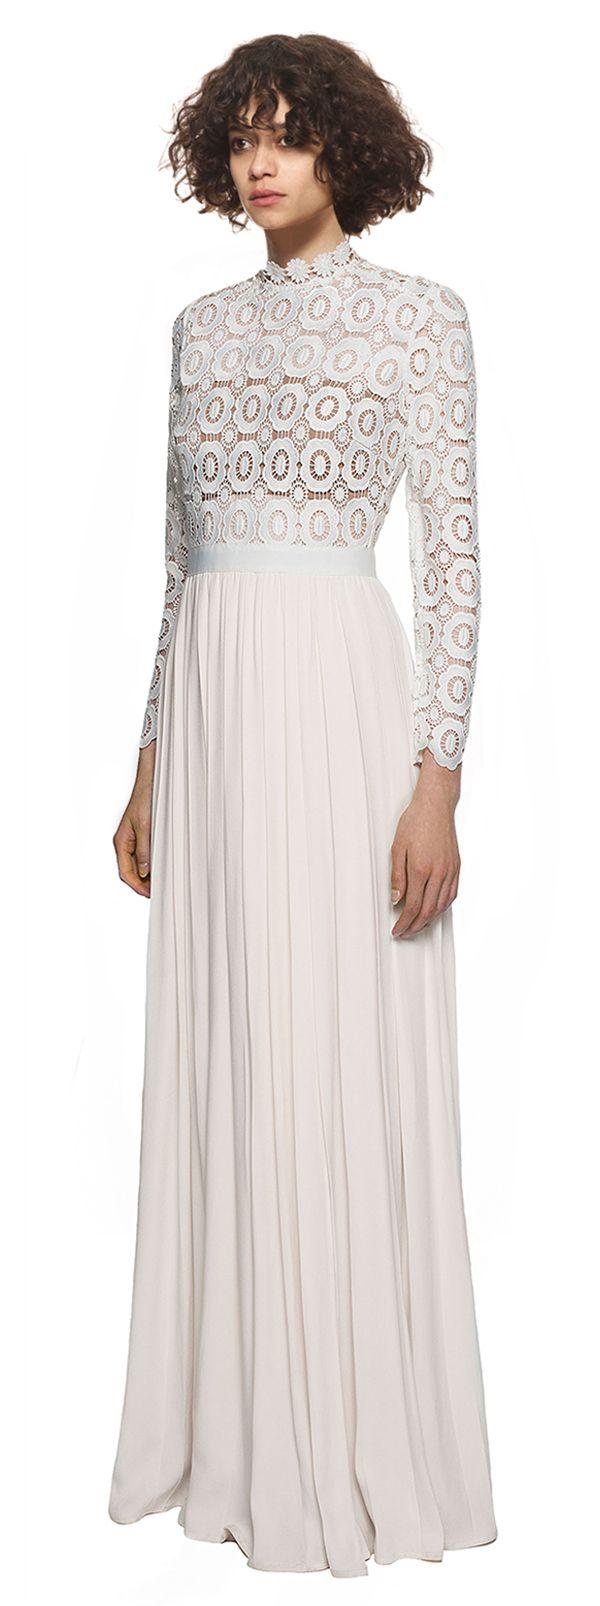 Floral maxi dress wedding  Pin by Jensen Van Meter on Wedding Dresses   Pinterest